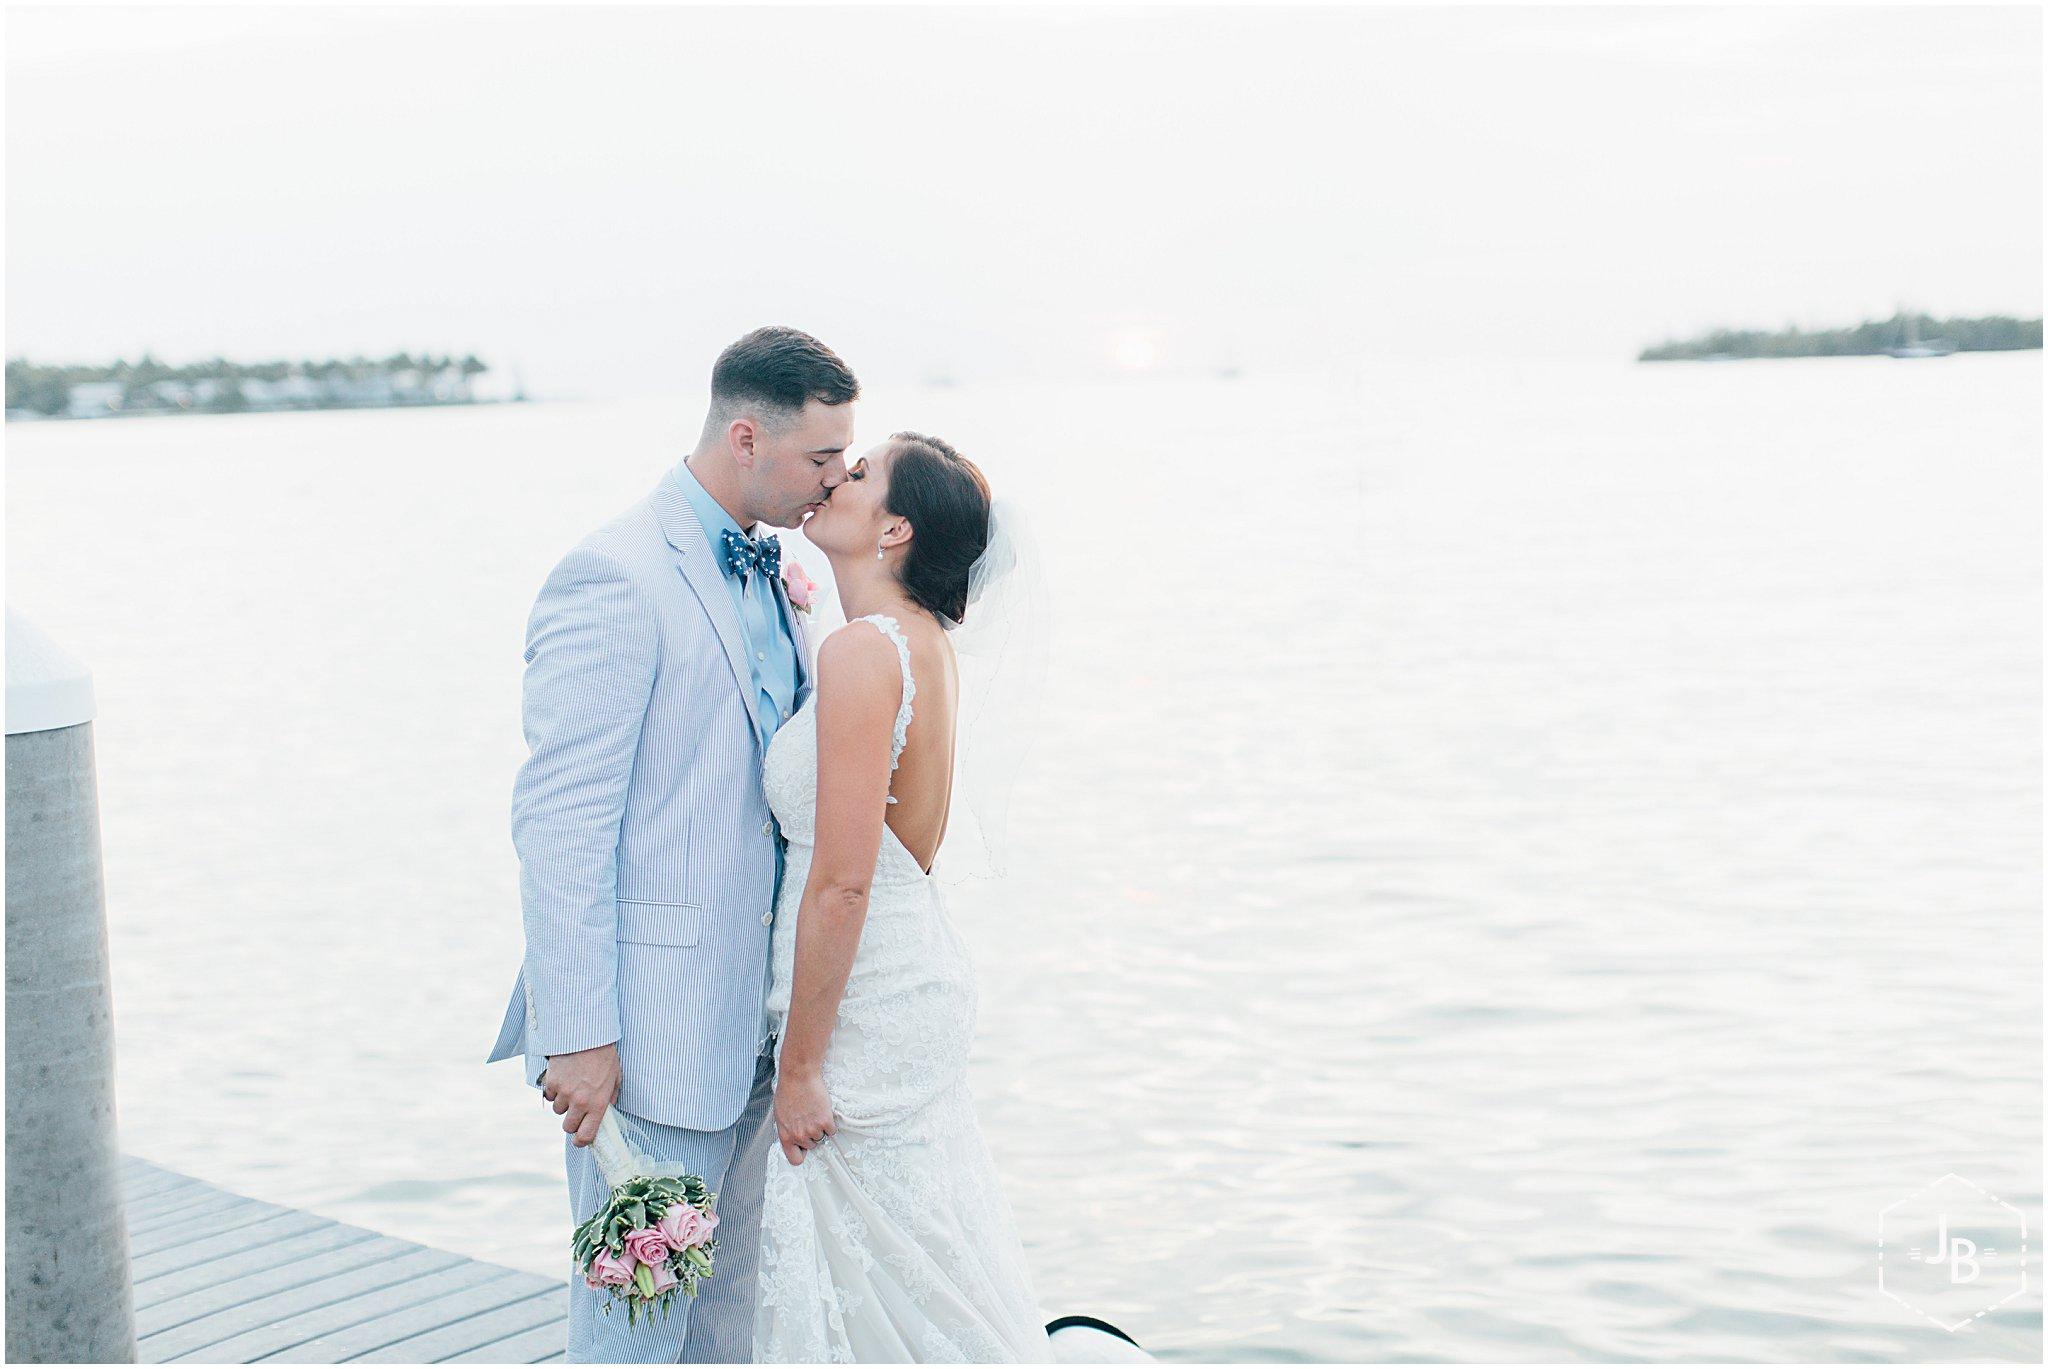 WeddingPhotographerSouthFlorida_0054.jpg